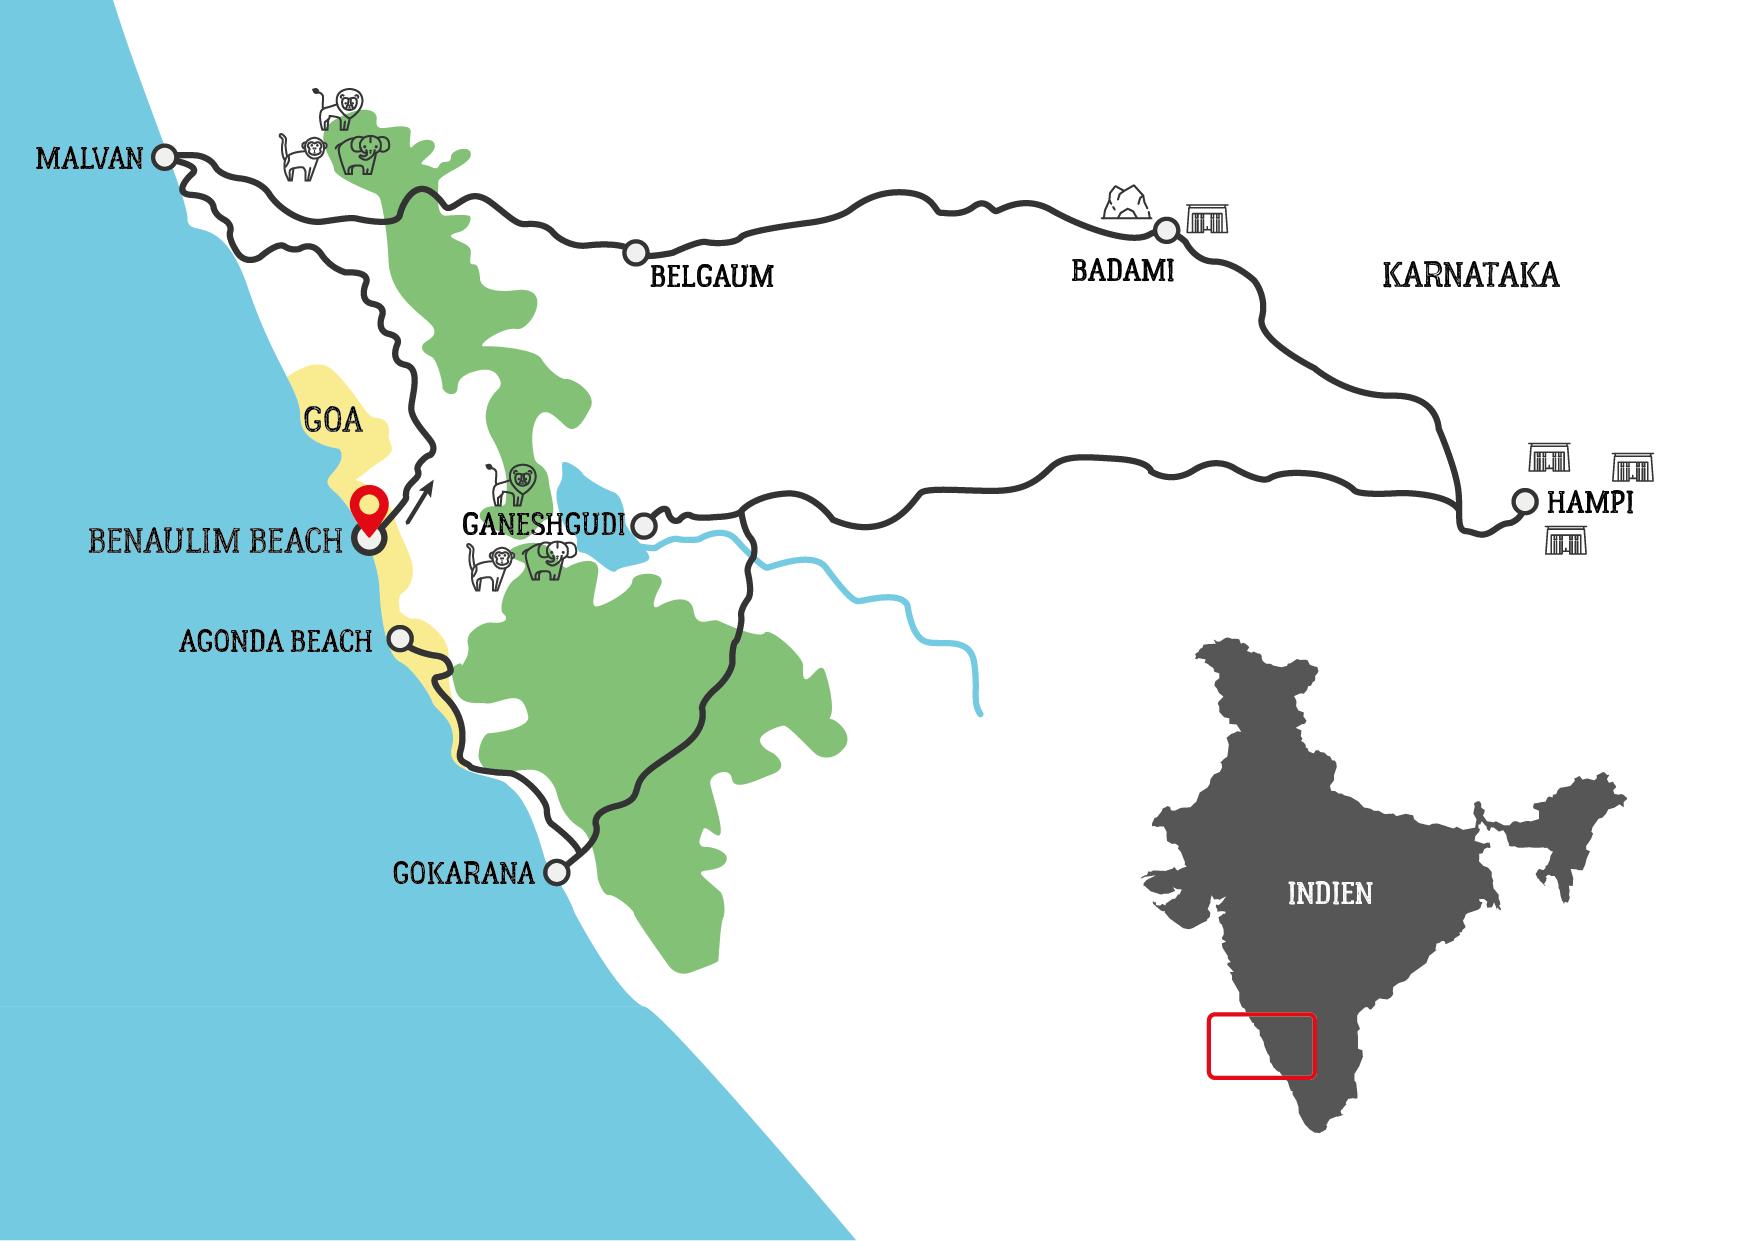 Classic Südindien und Goa Motorradtour Karte